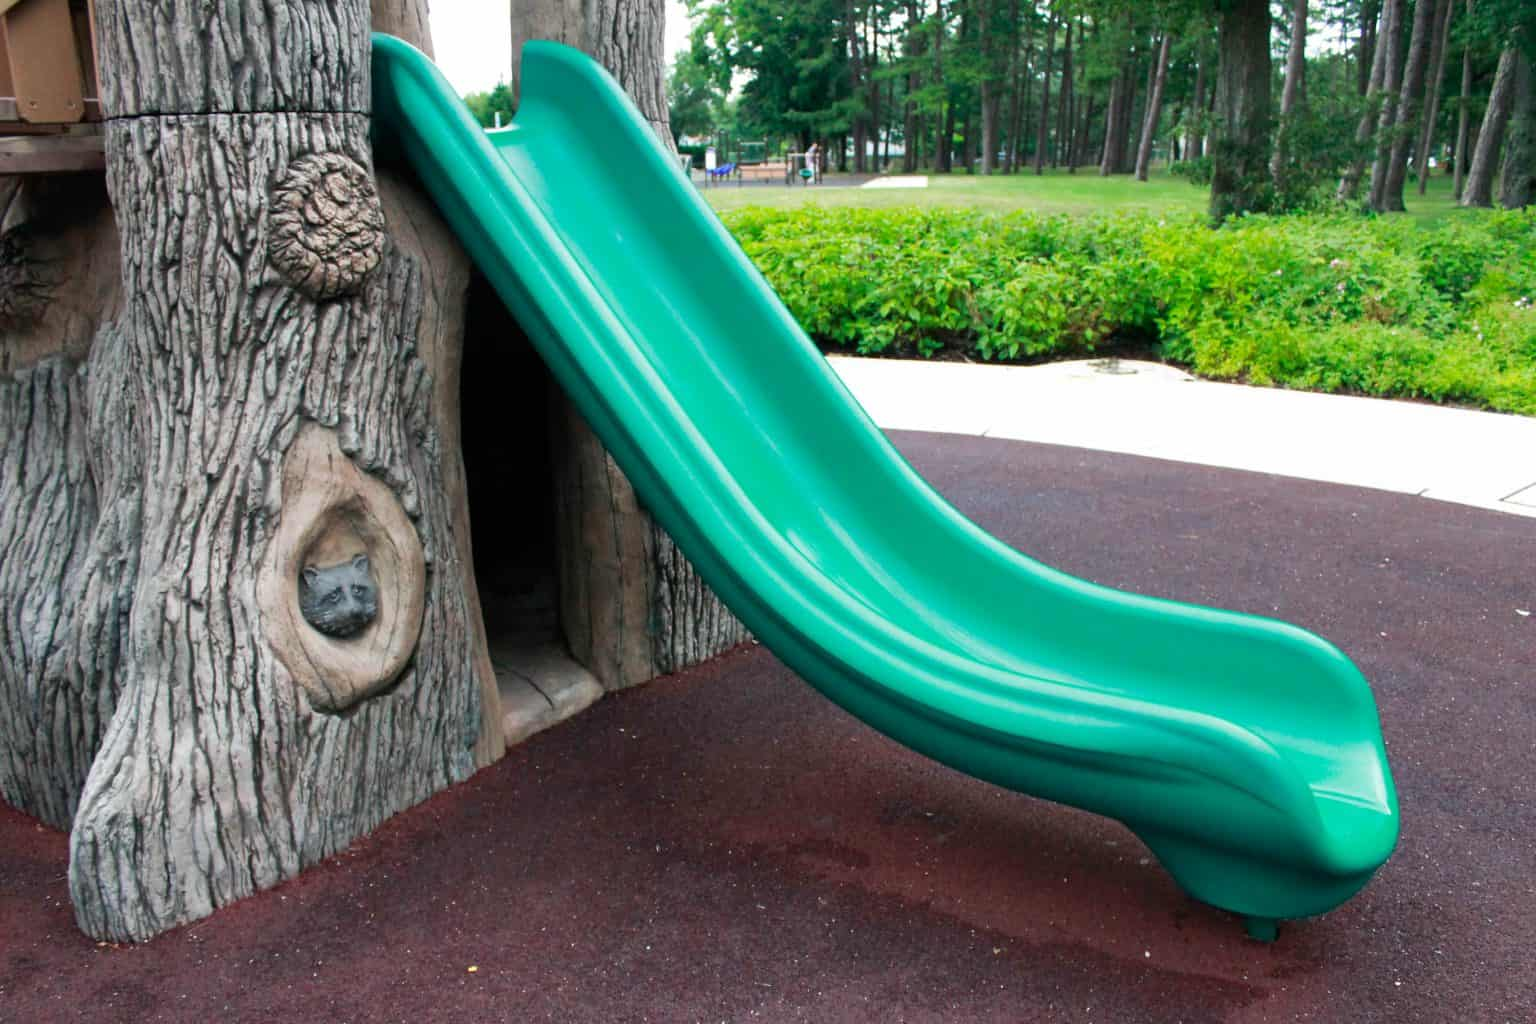 windward-beach-park-playground-brick-nj_27651268734_o-1536x1024